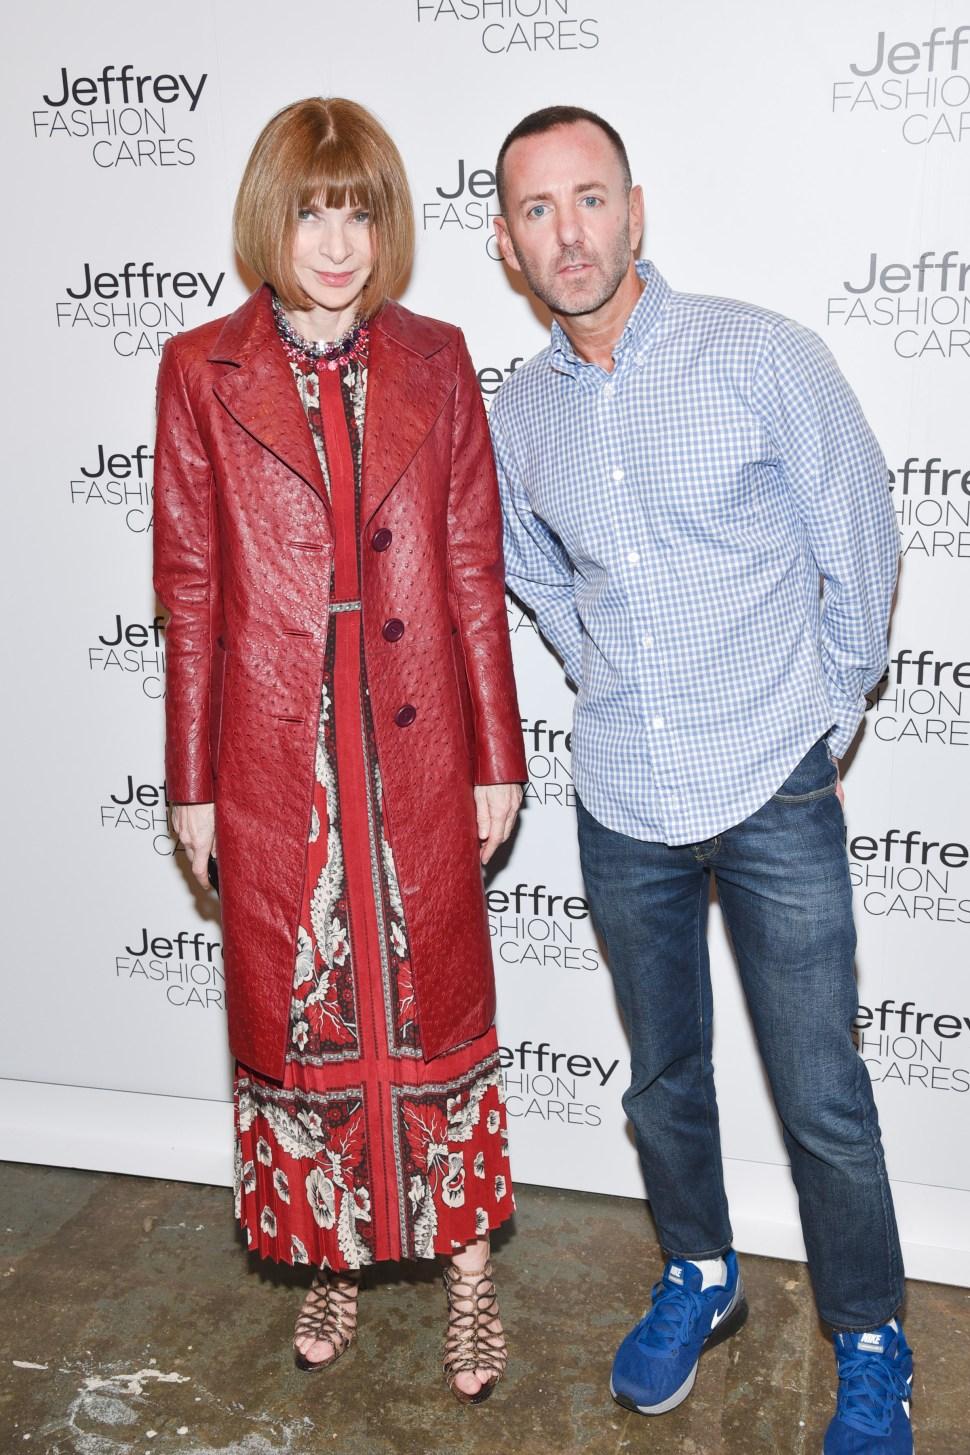 Jeffrey Fashion Cares 2015